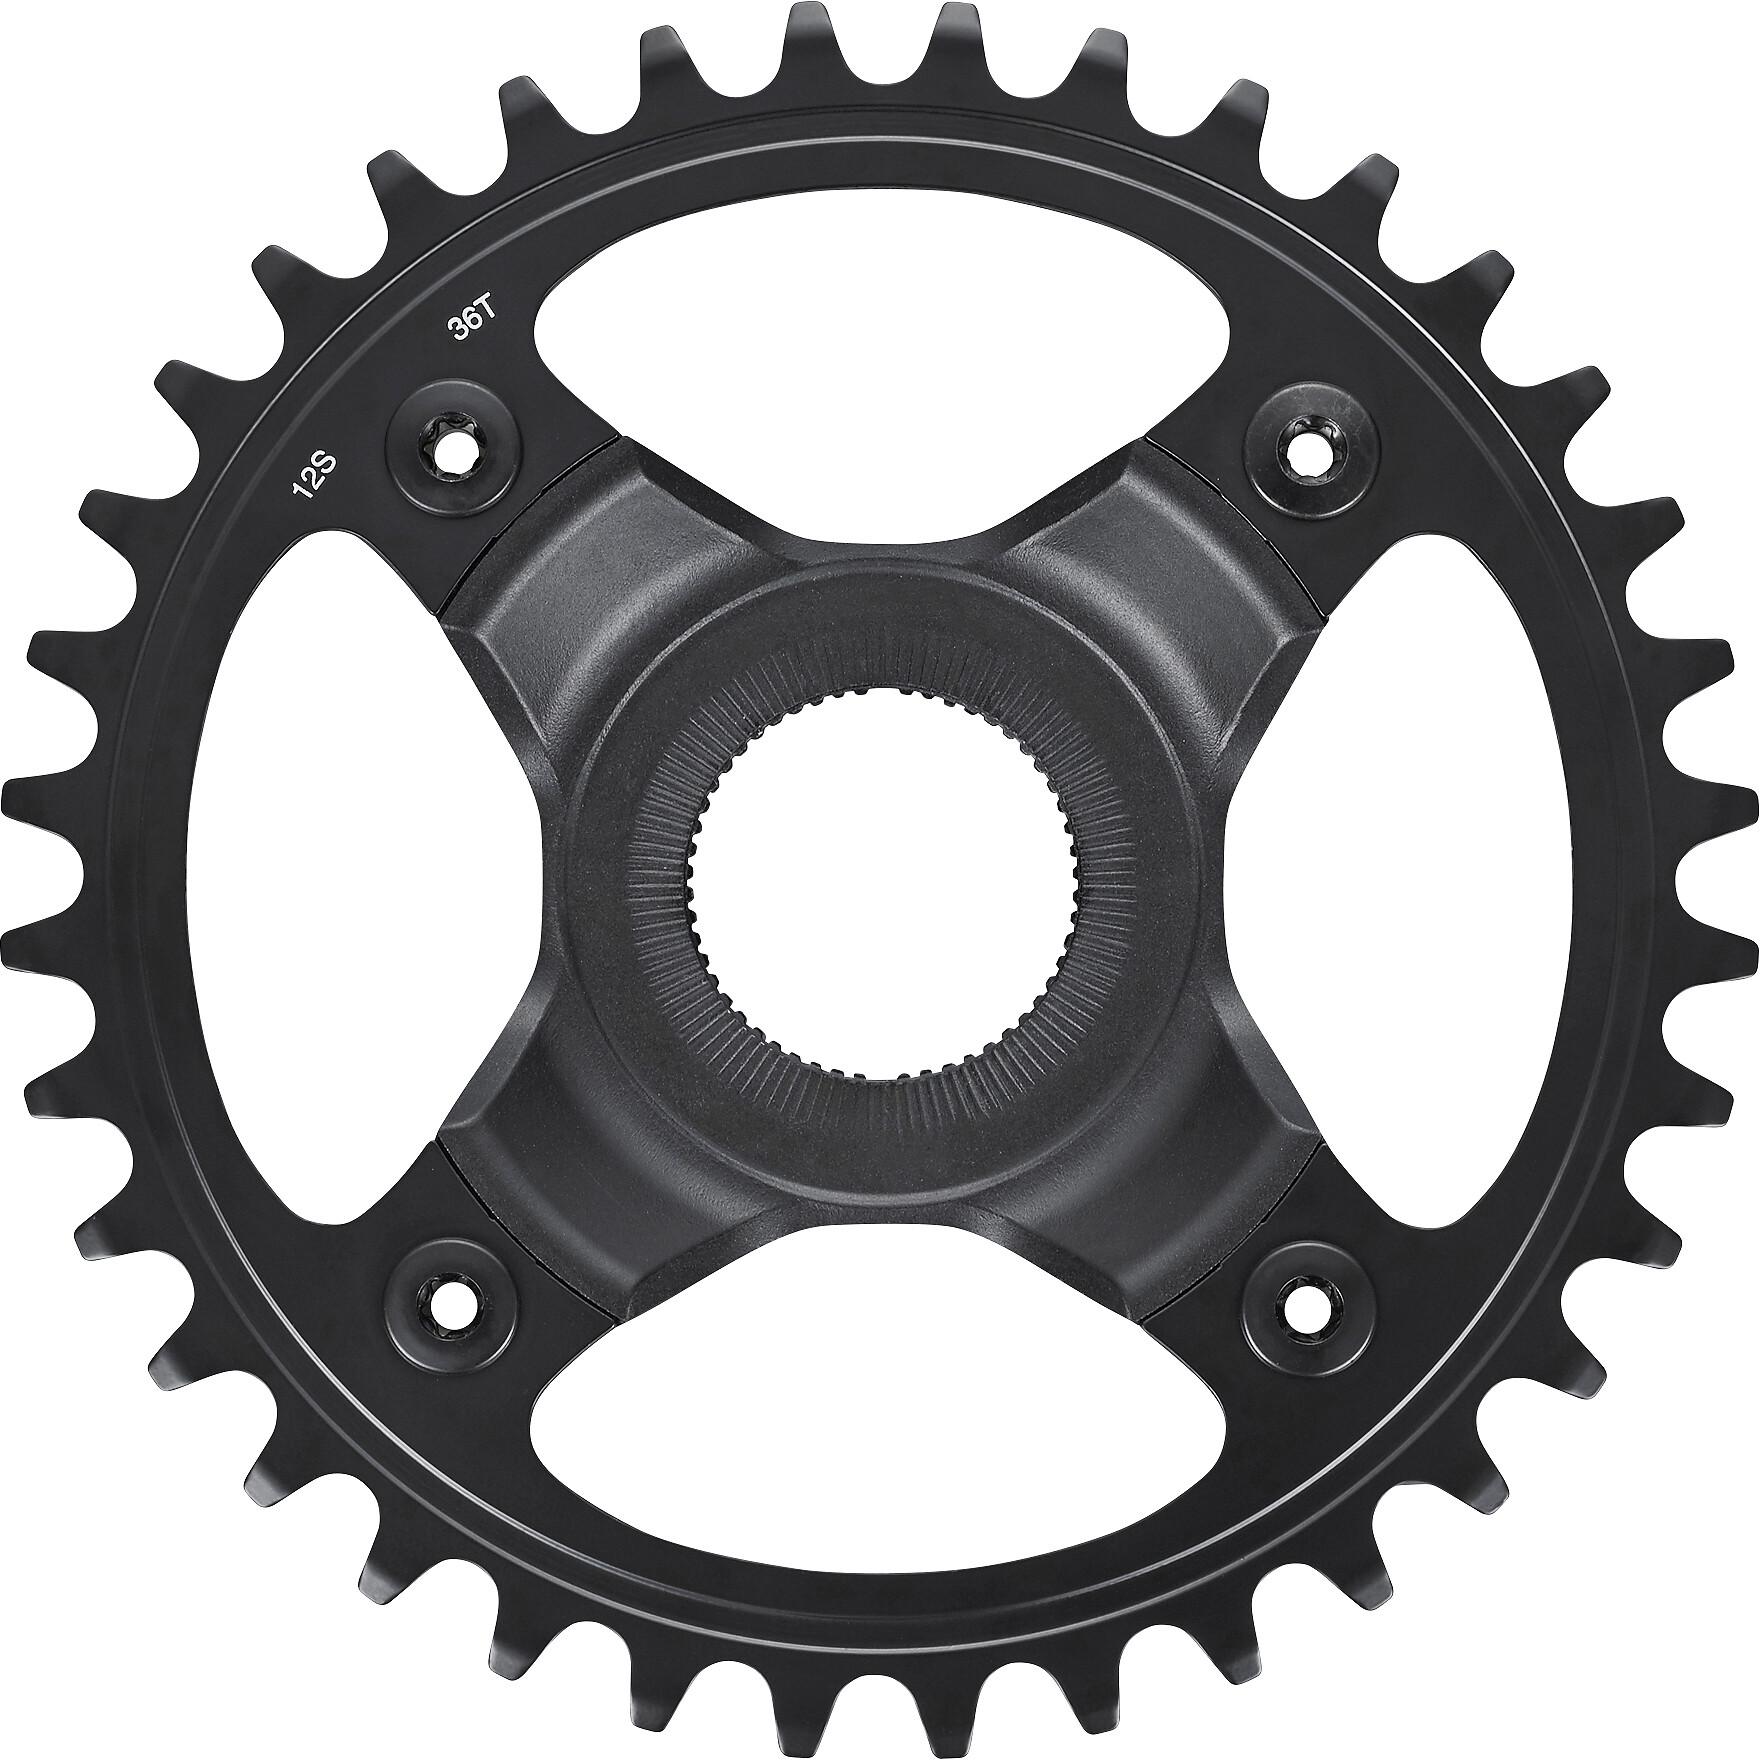 Shimano Fahrrad Kugellager günstig kaufen | eBay